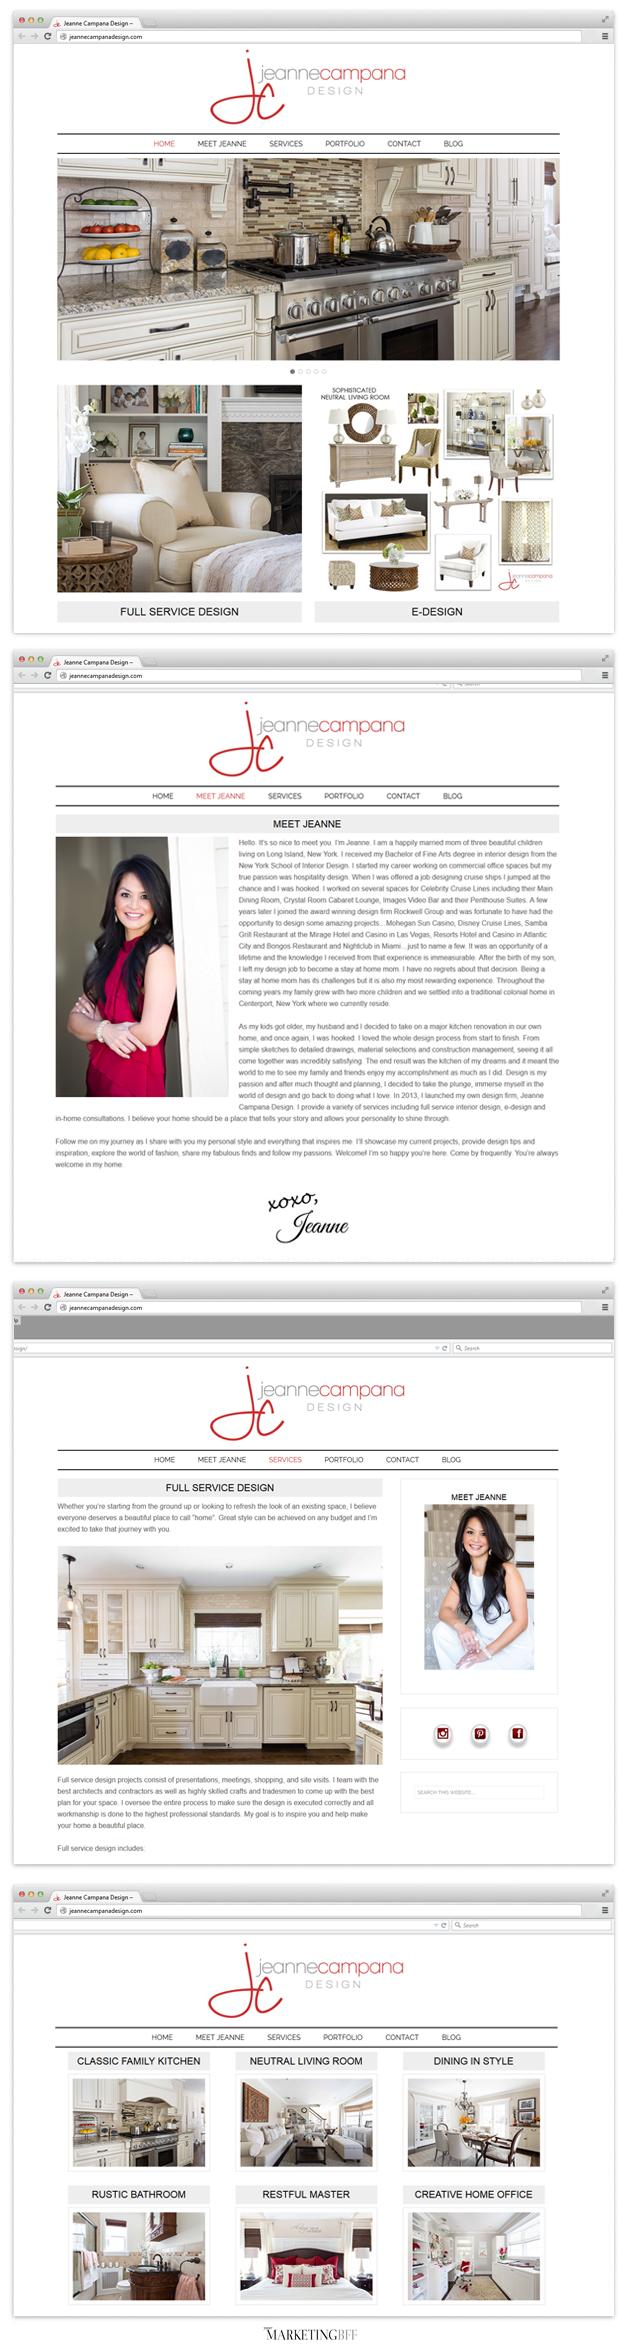 Your Marketing BFF website design_ JeannaCampanaDesign